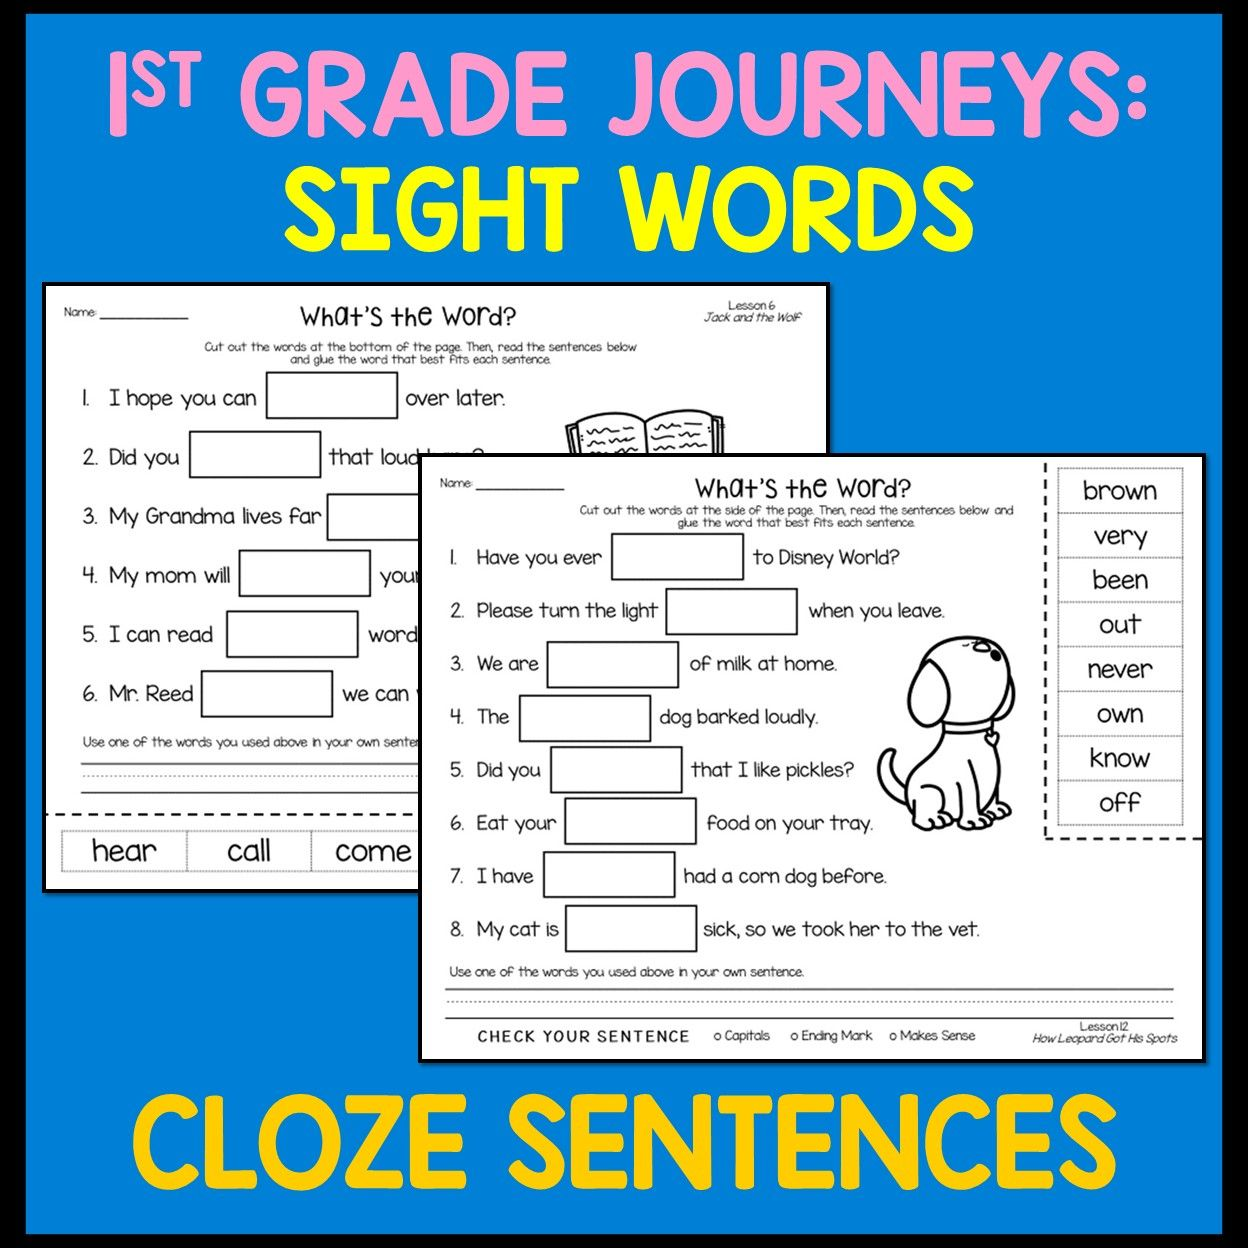 hight resolution of Cloze Sentences for 1st Grade Journeys Sight Words   Sight words